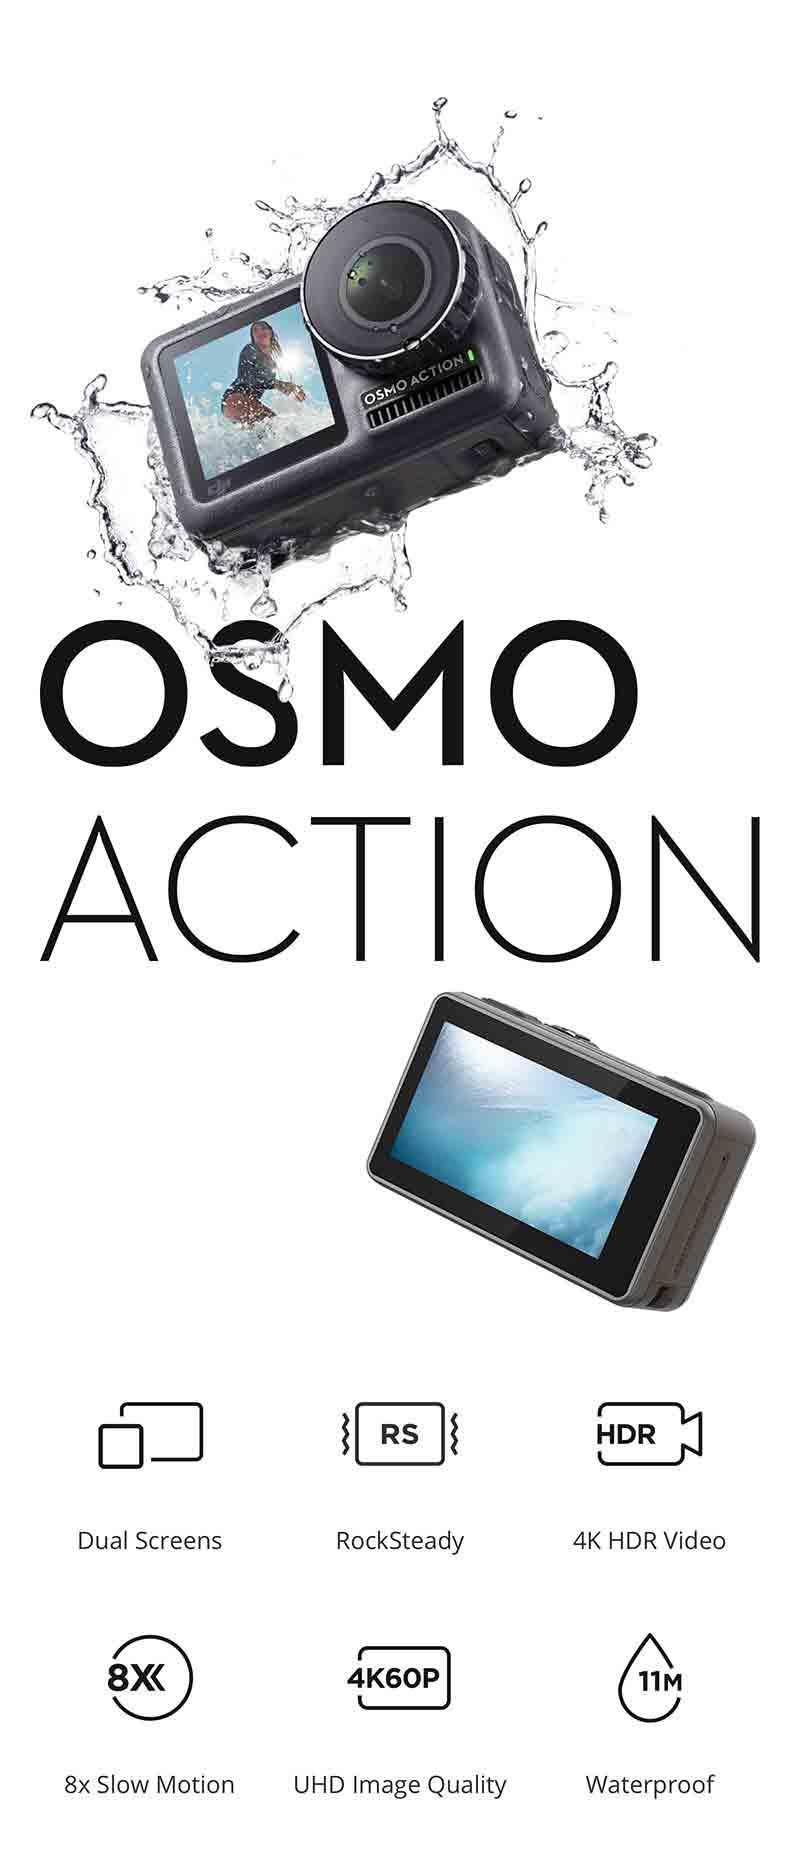 316927_des02_dji_osmo_action.jpg